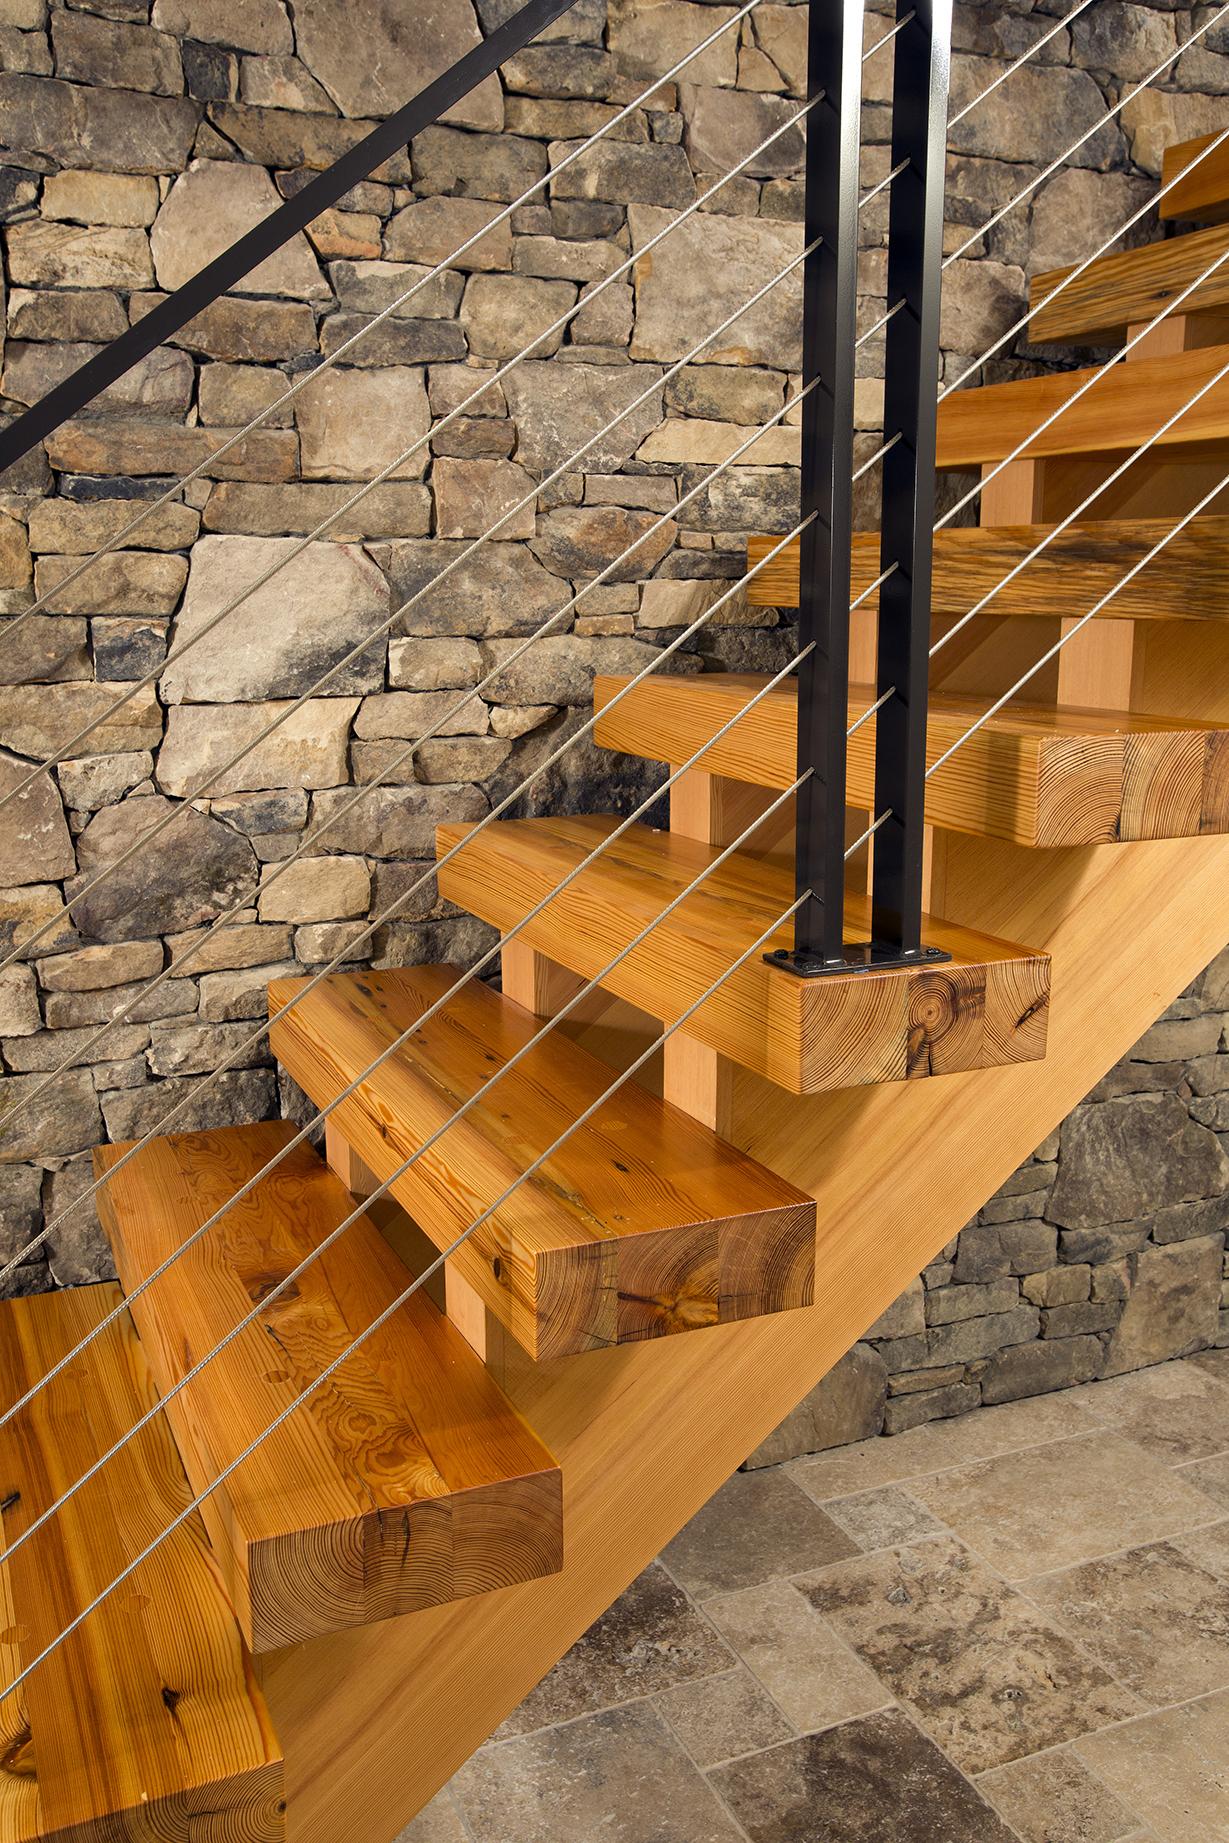 Heart pine stair treads. Photo © Greg Hadley Photography